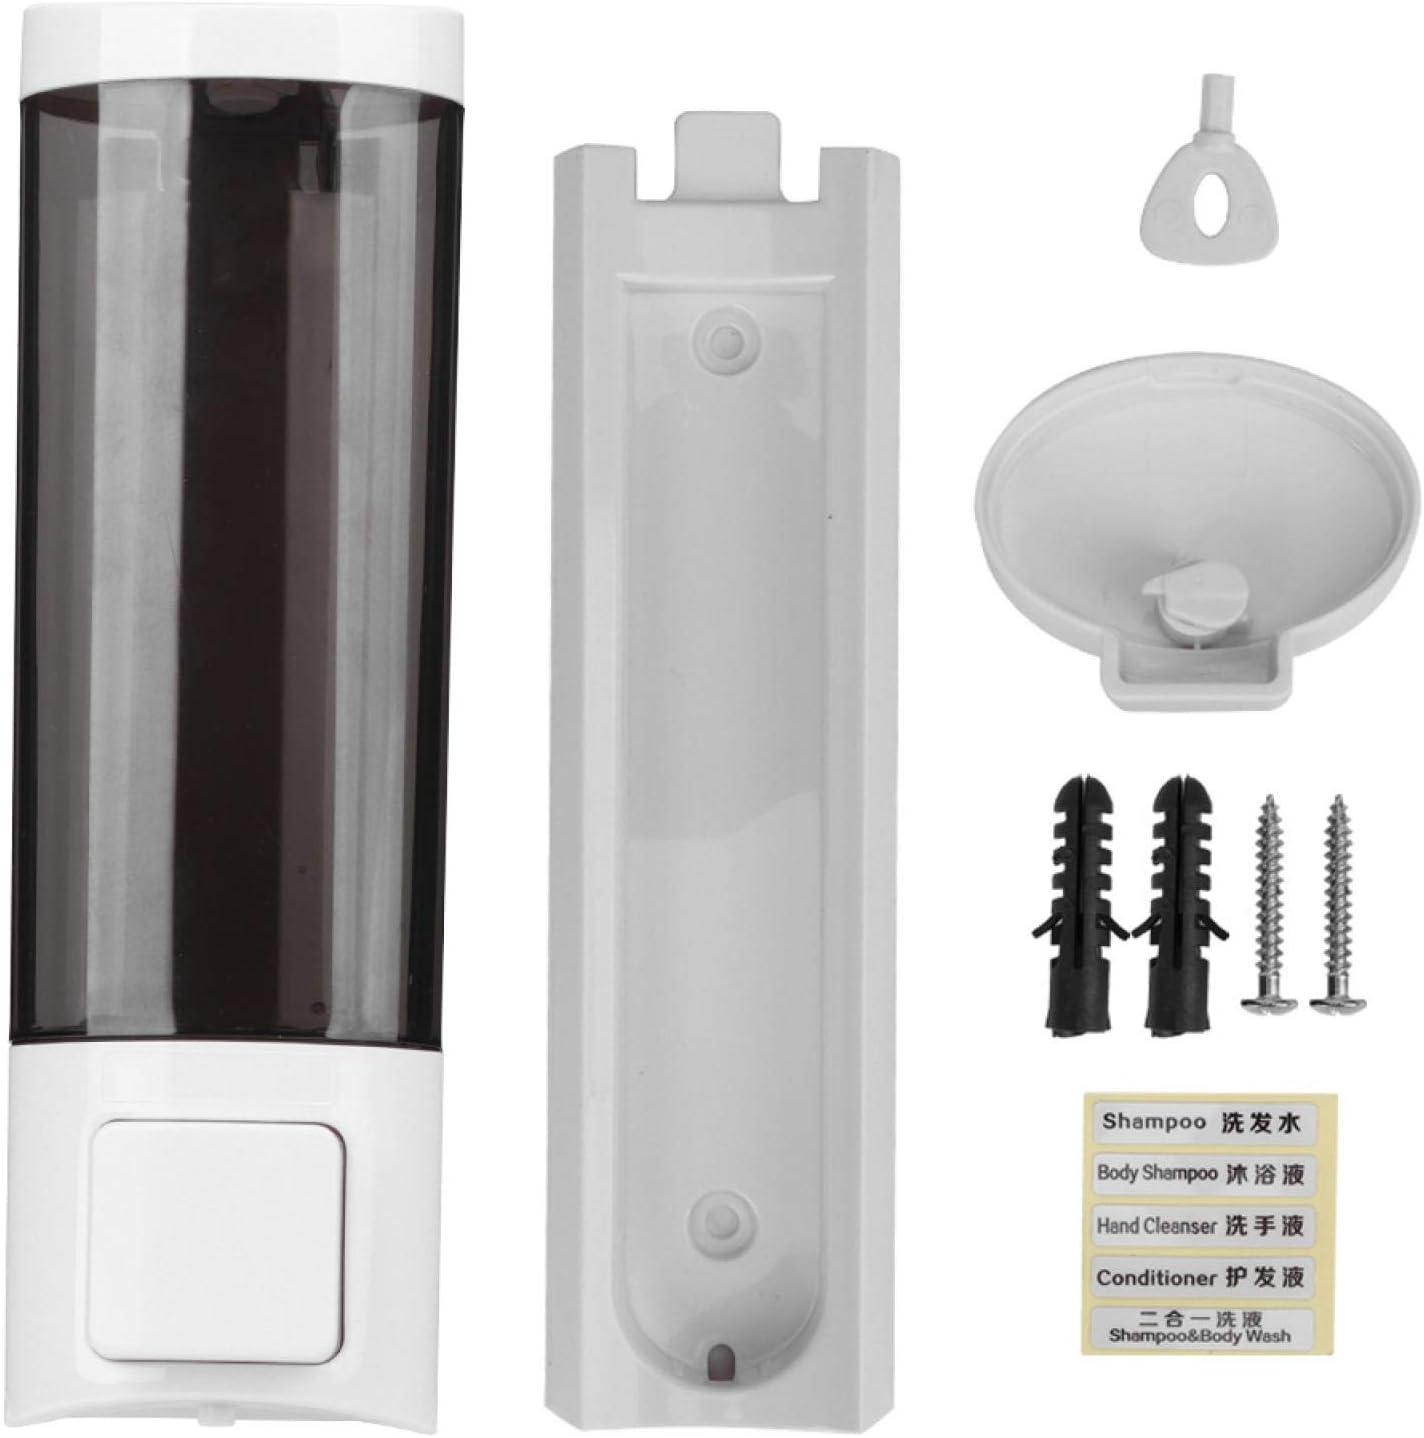 Jeanoko Lotion Dispenser Rustproof Dispense Single Shampoo Max 90% OFF Spring new work Head